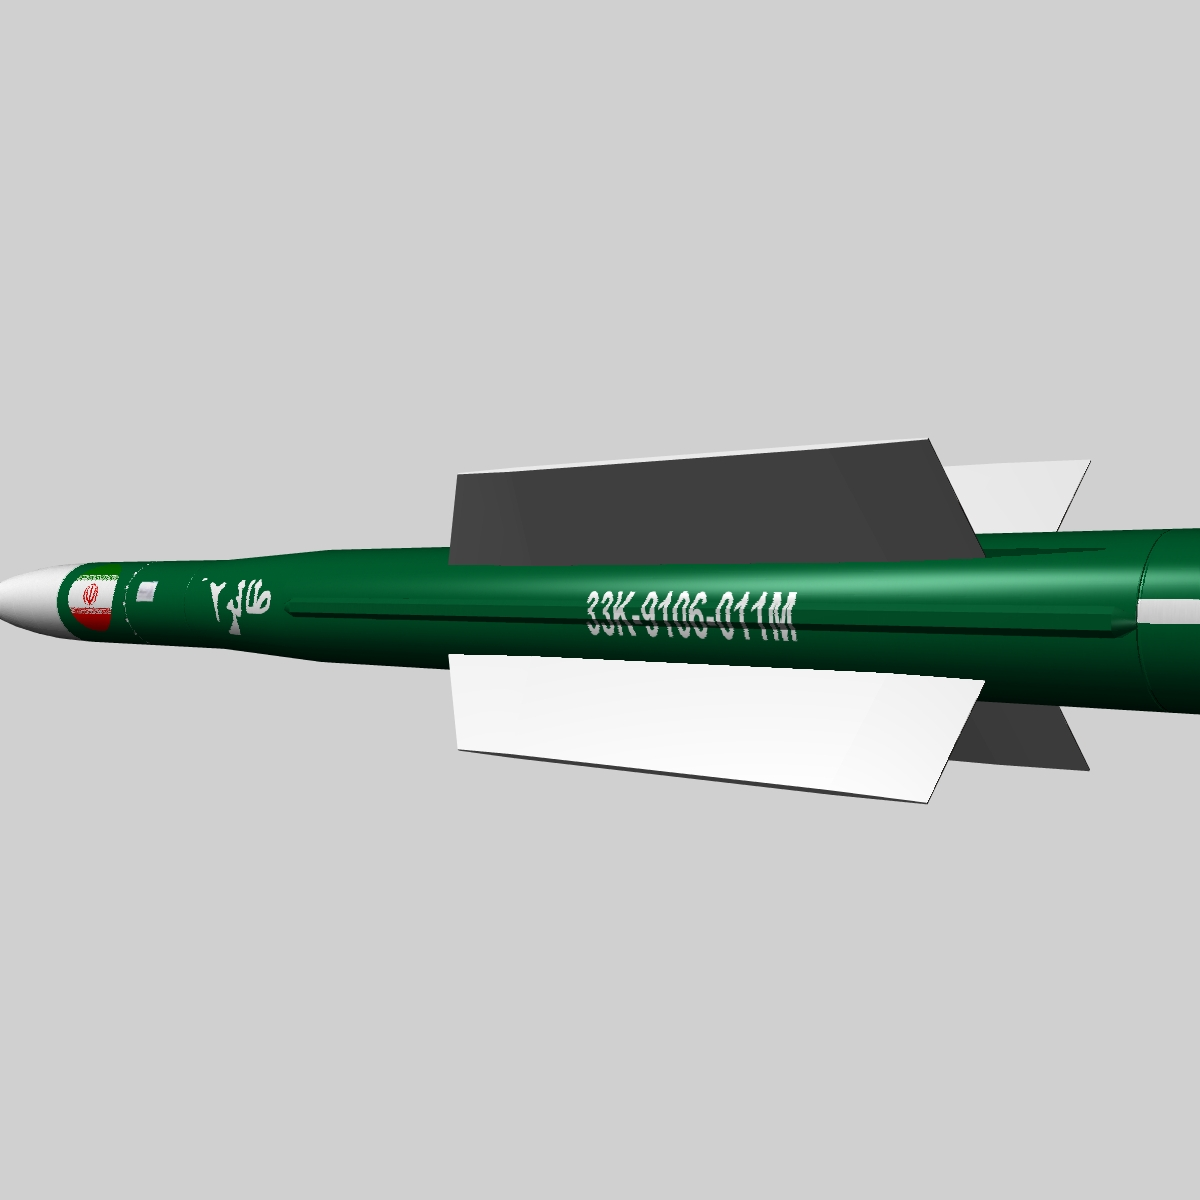 iranian taer-2 eldflaug 3d líkan 3ds dxf x þorskskoða obj 149241